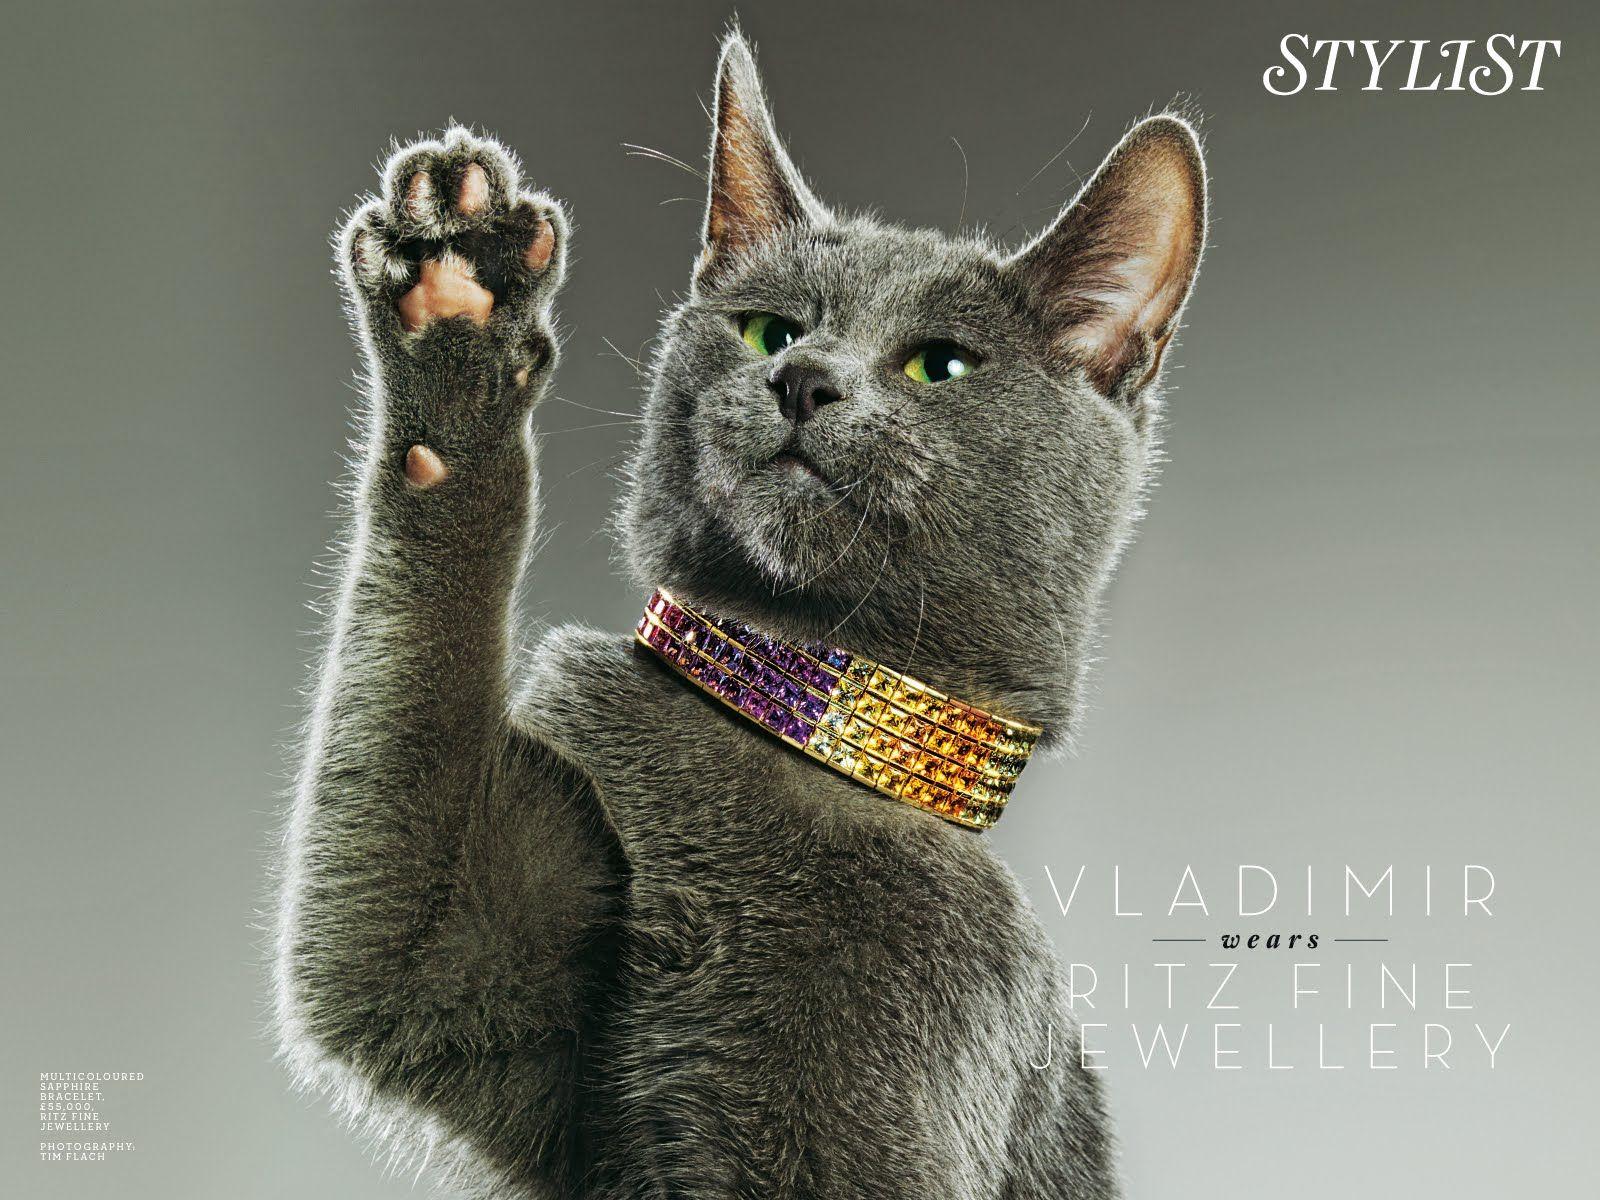 Valdimir in Ritz fine jewelery